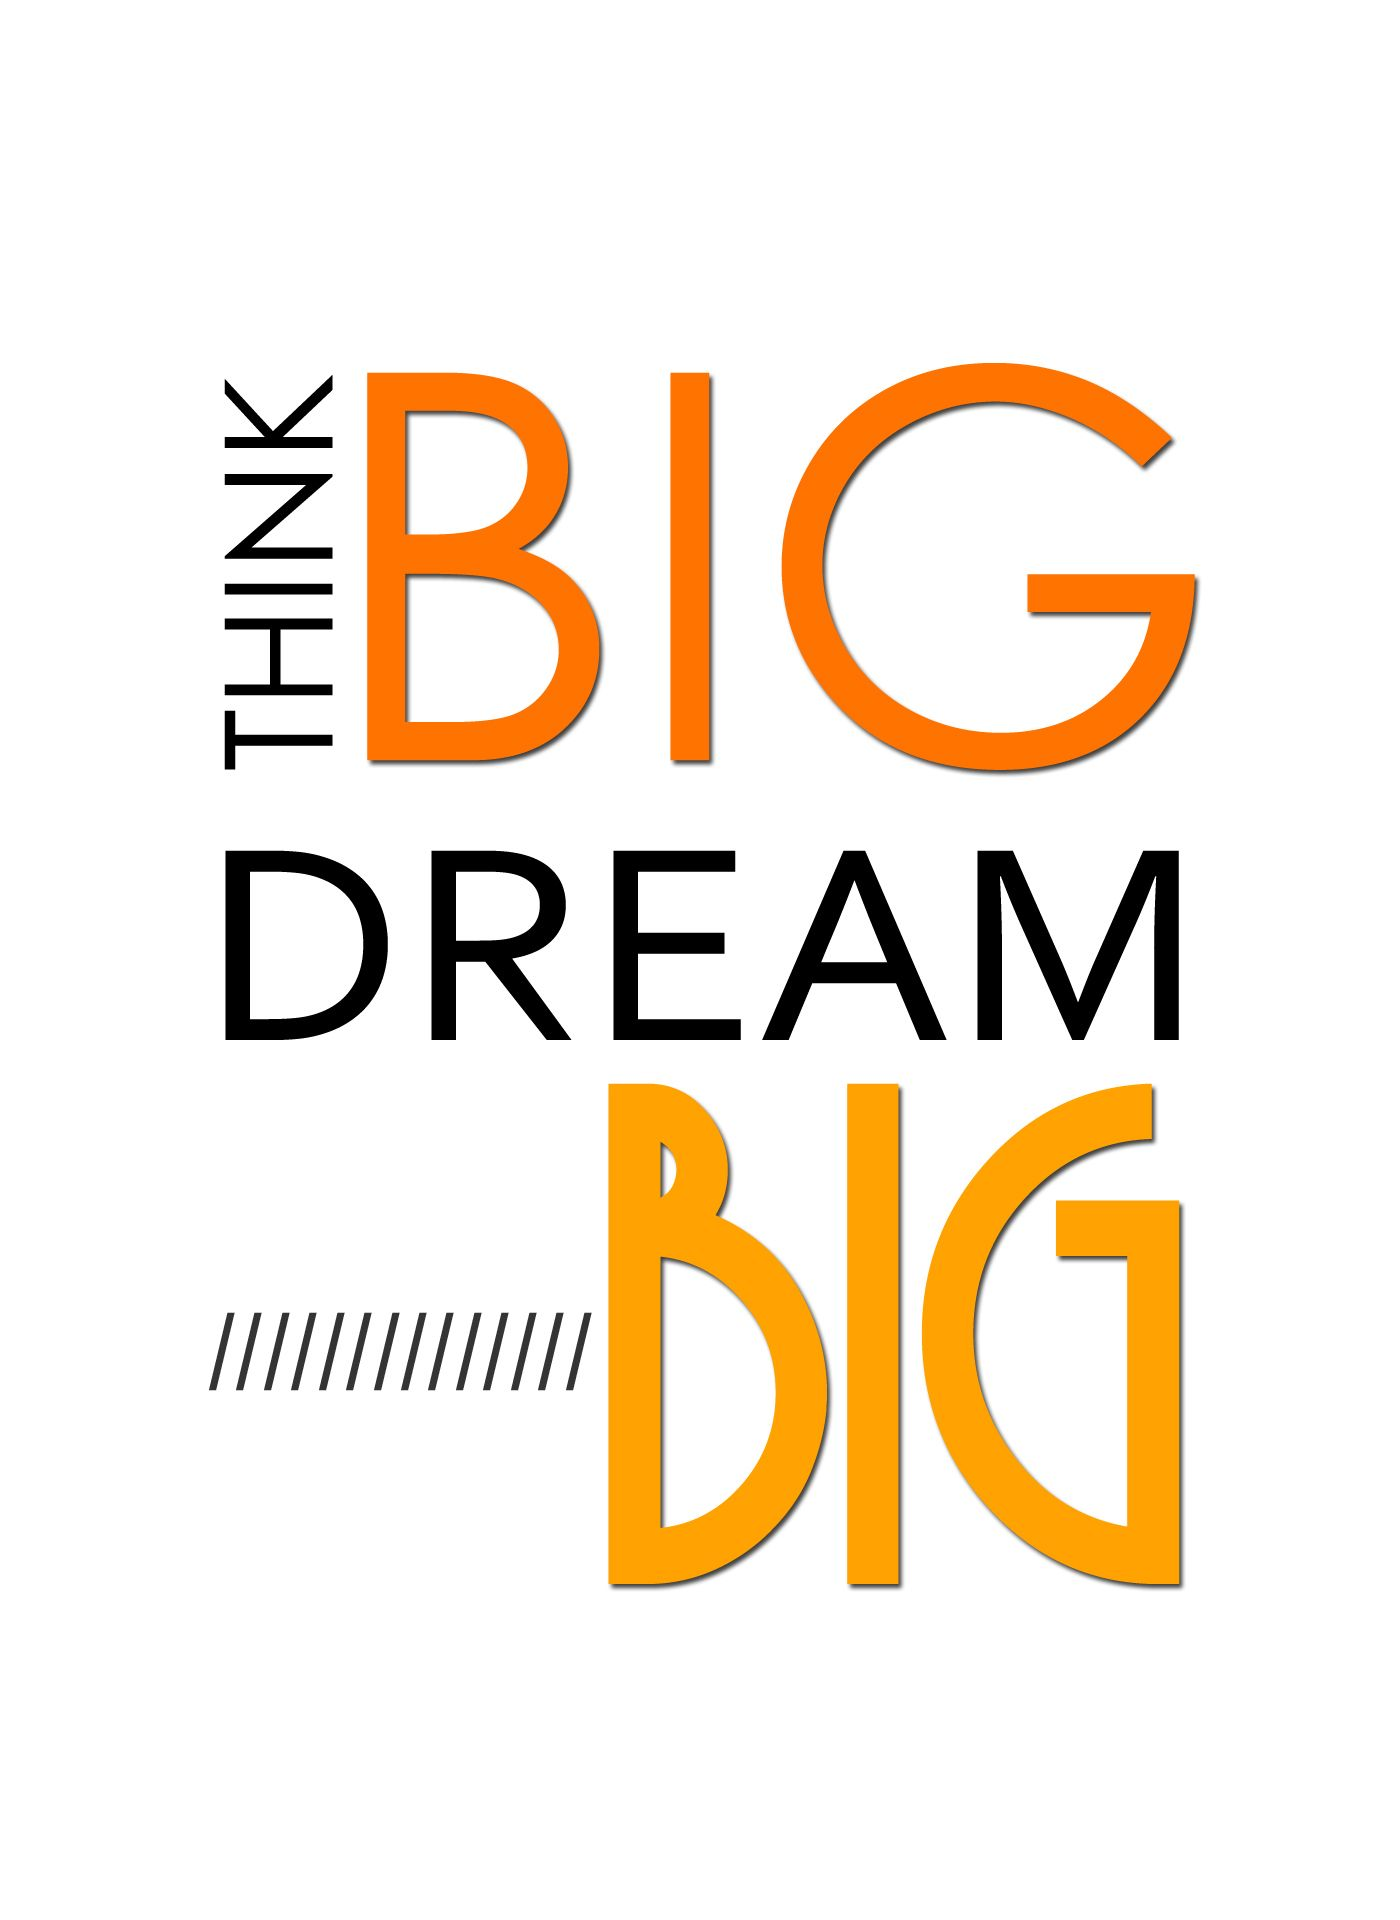 Dream Big Motivational Quotes Motivational, Inspirational